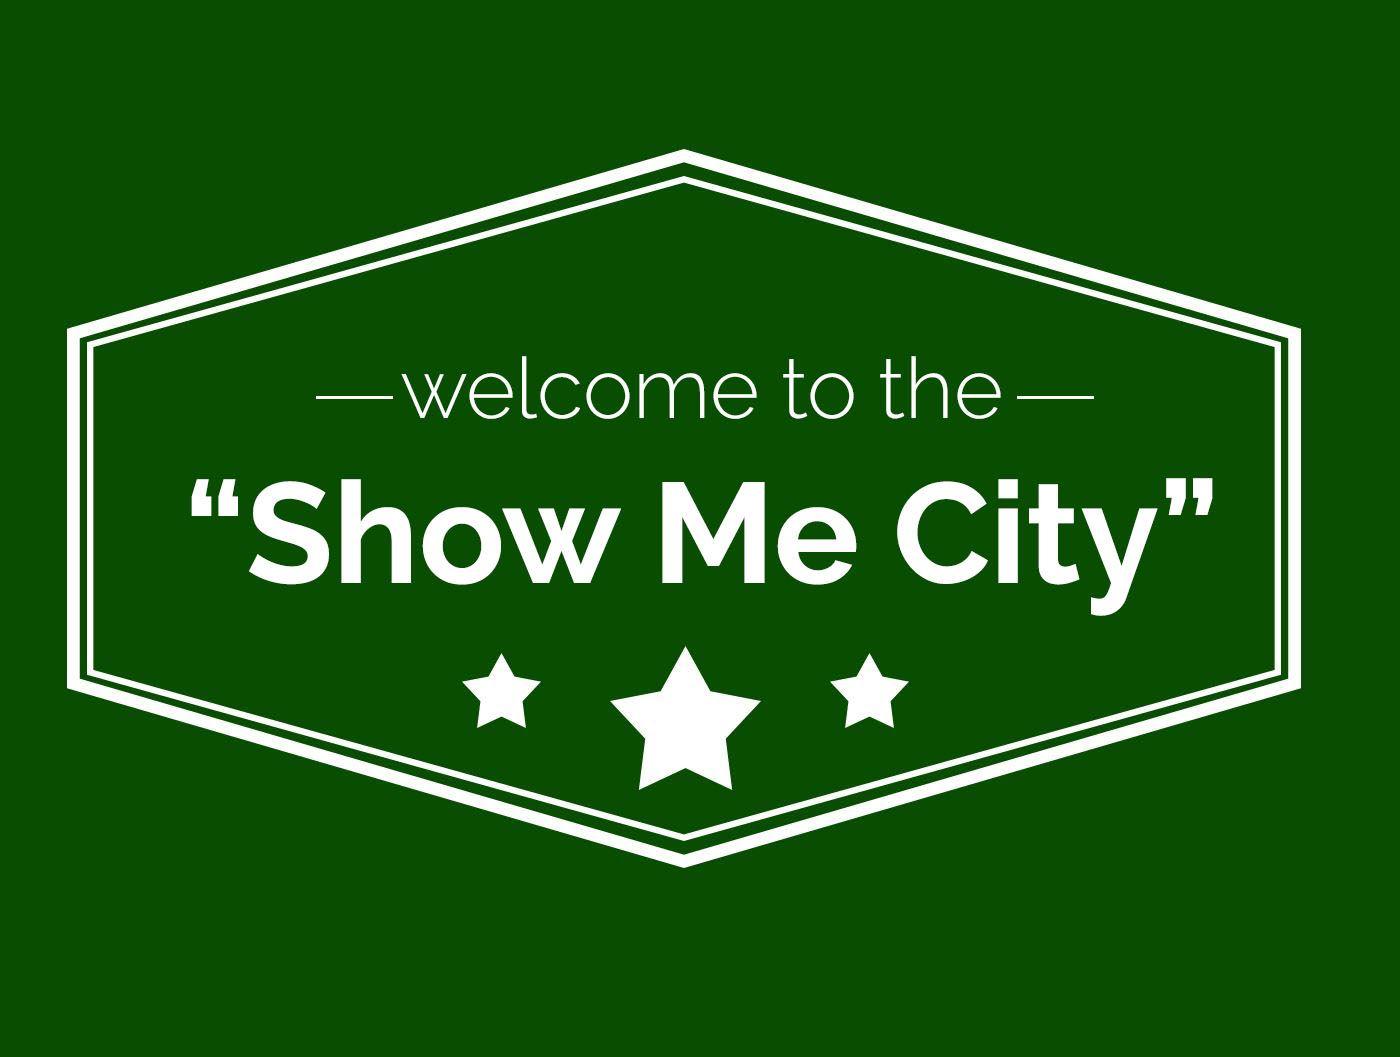 Missouri city tx official website official website i am visiting 1betcityfo Choice Image